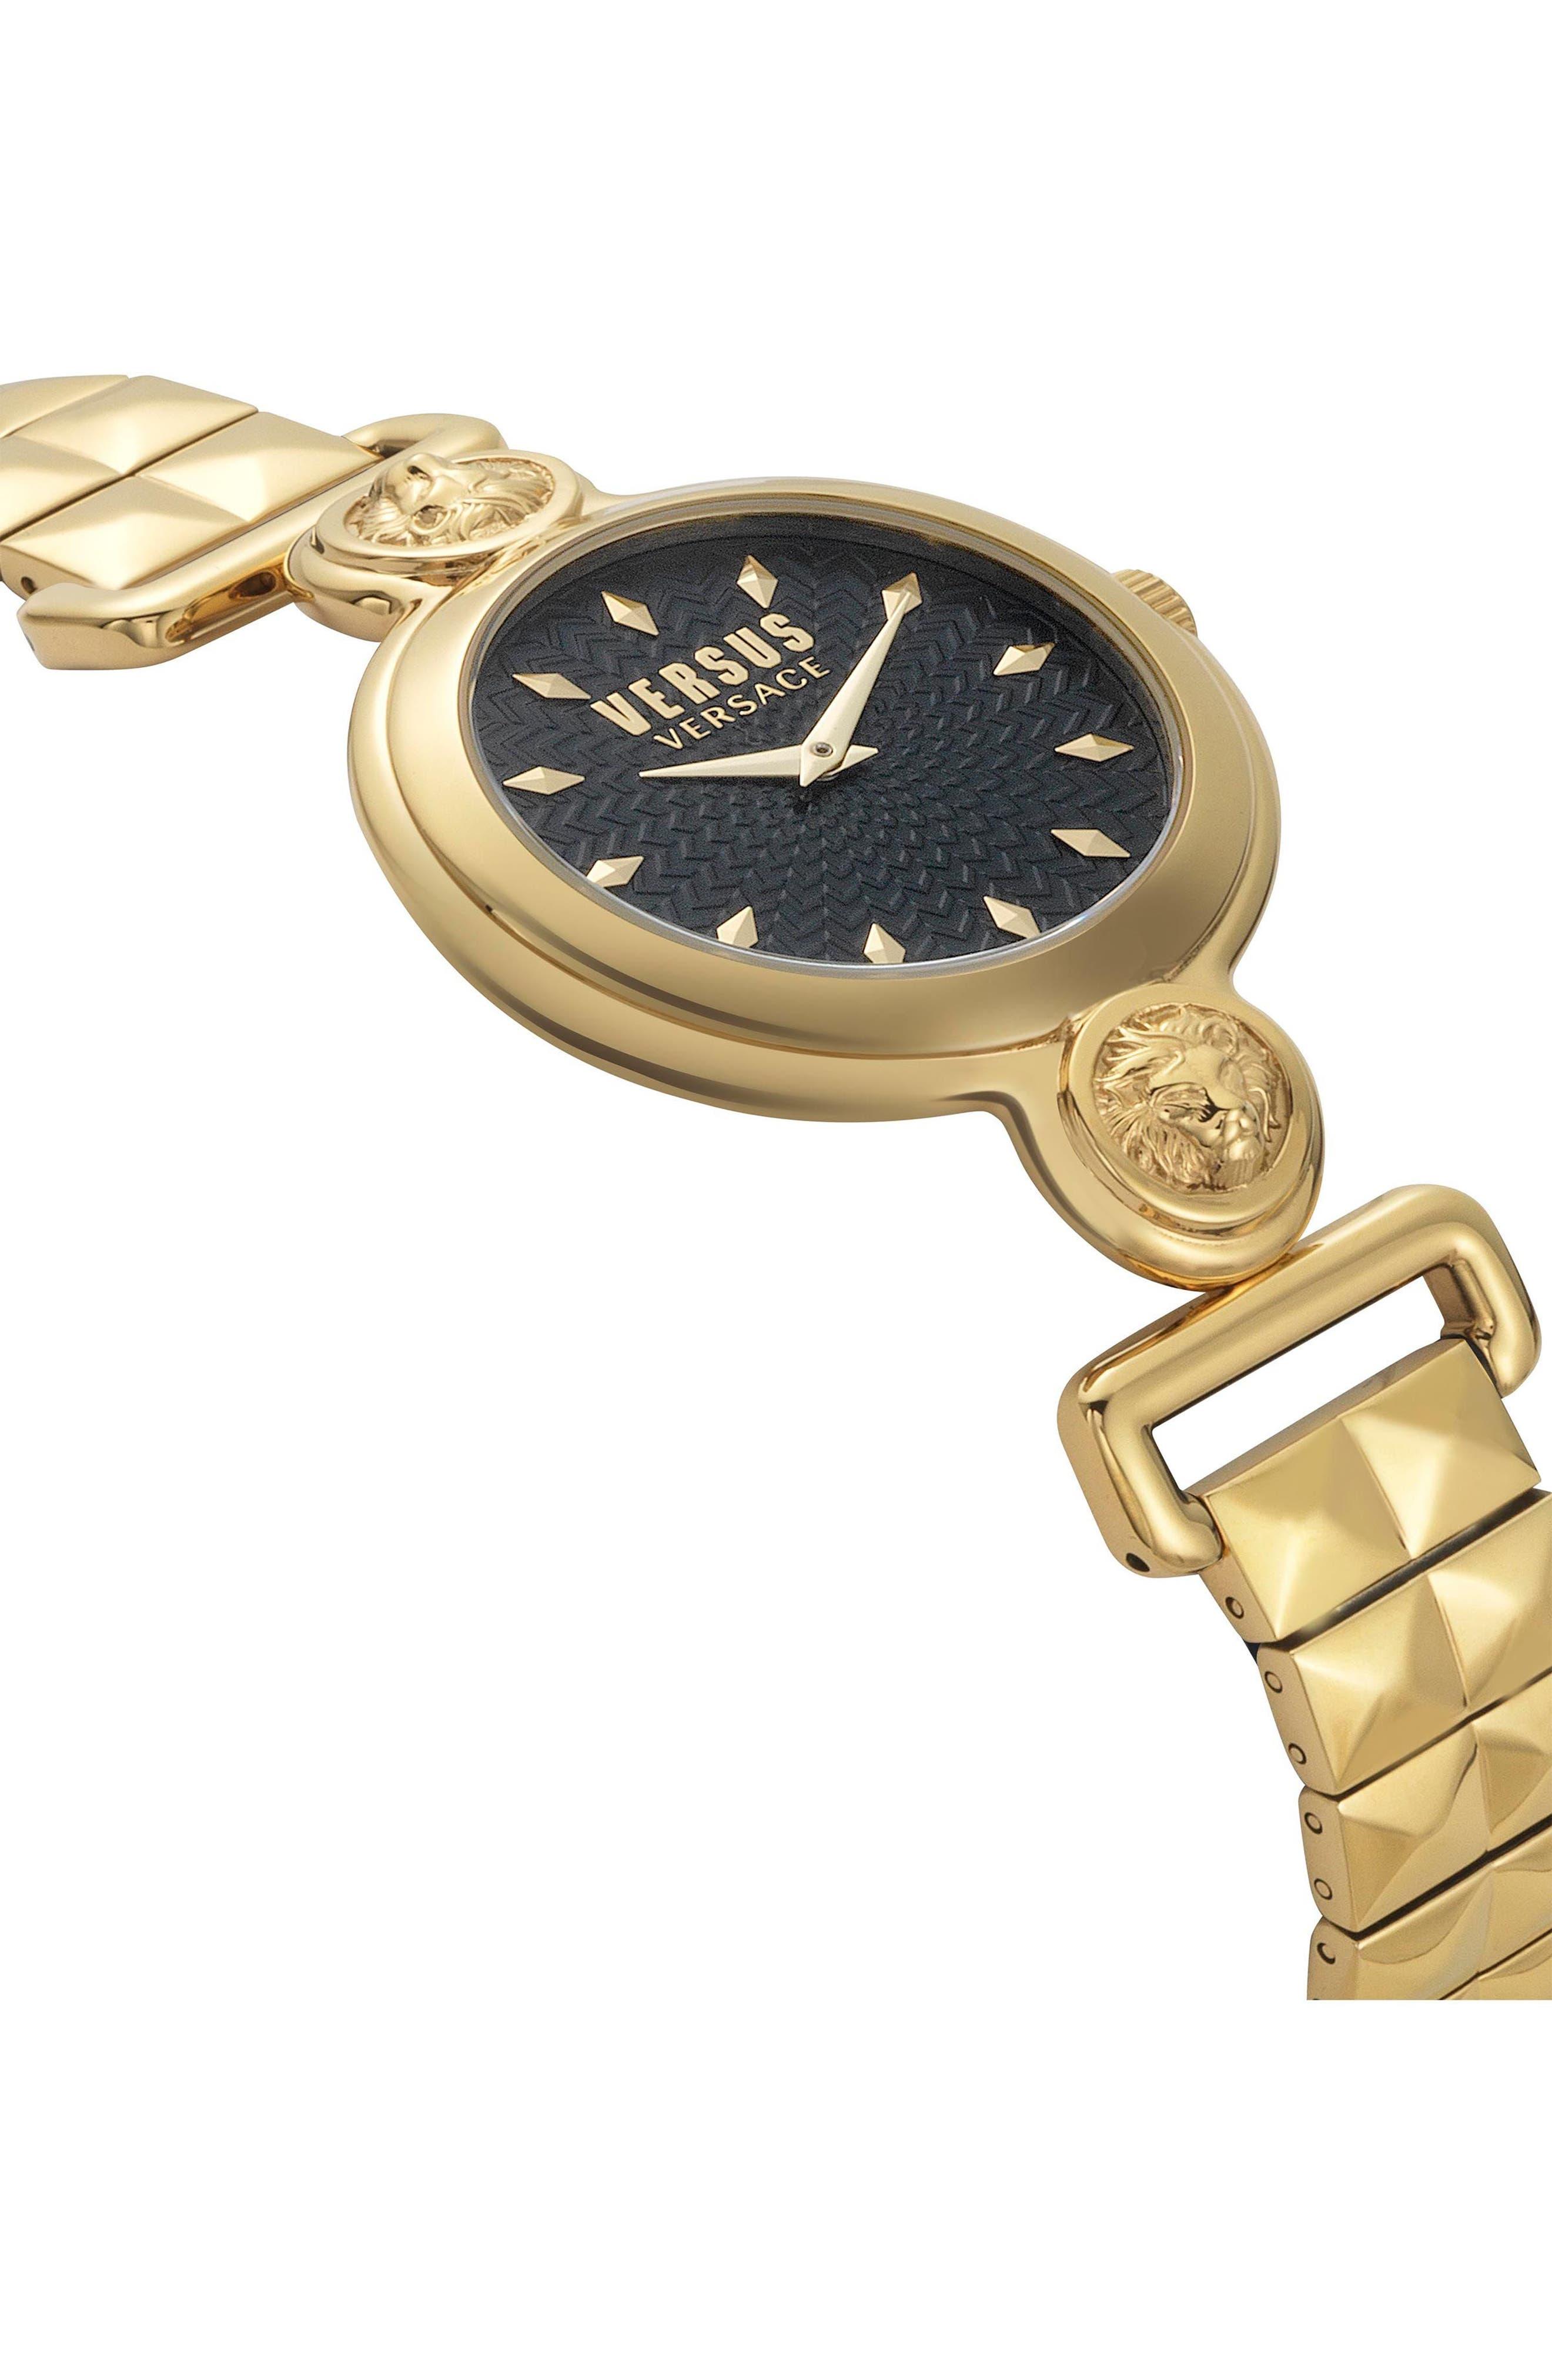 VERSUS VERSACE, Sunnyridge Bracelet Watch, 34mm, Alternate thumbnail 3, color, GOLD/ BLACK/ GOLD